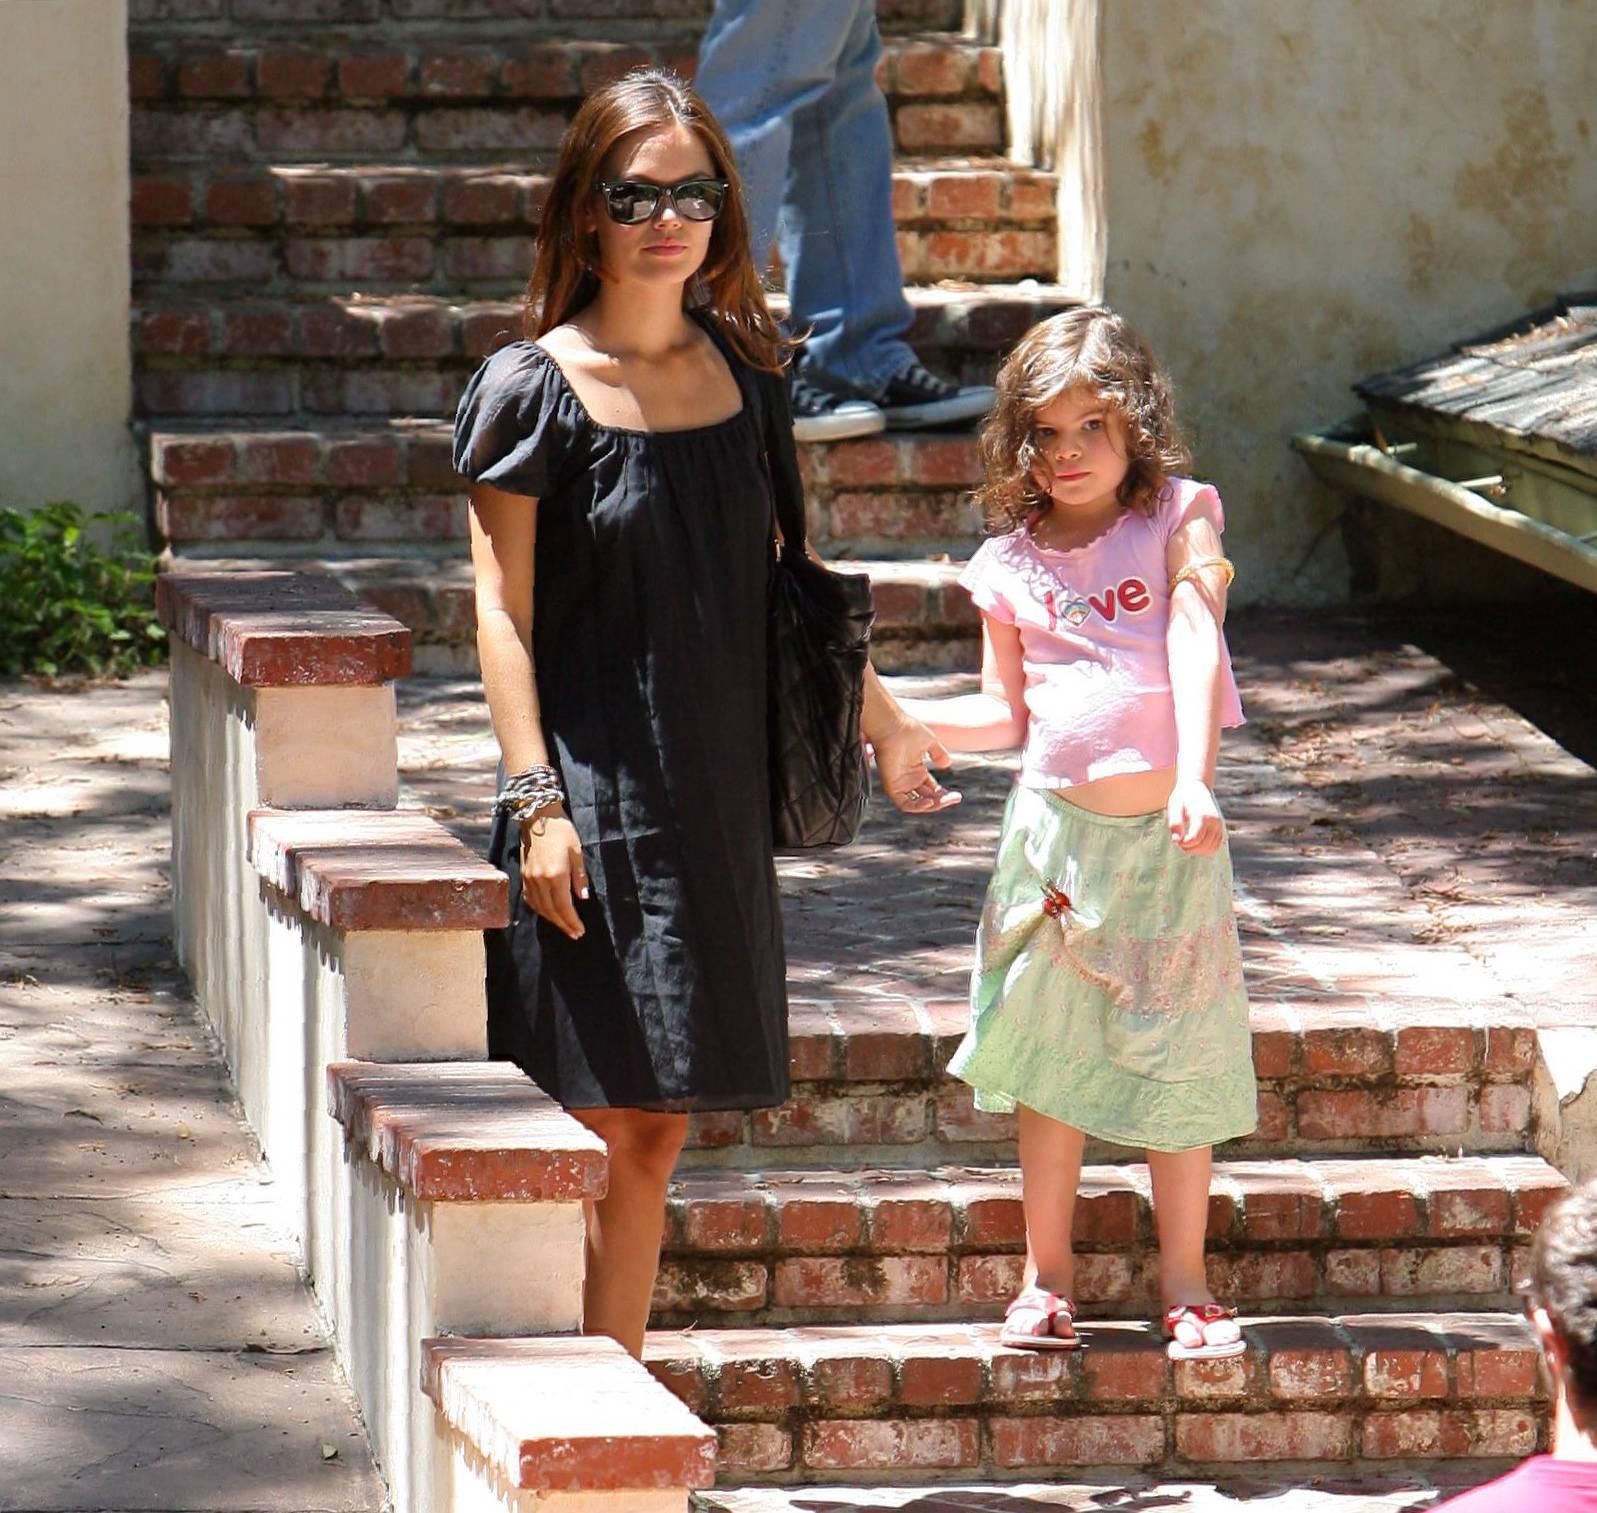 73094_Rachel_Bilson_with_her_sister_in_Hollywood_01_445lo.jpg